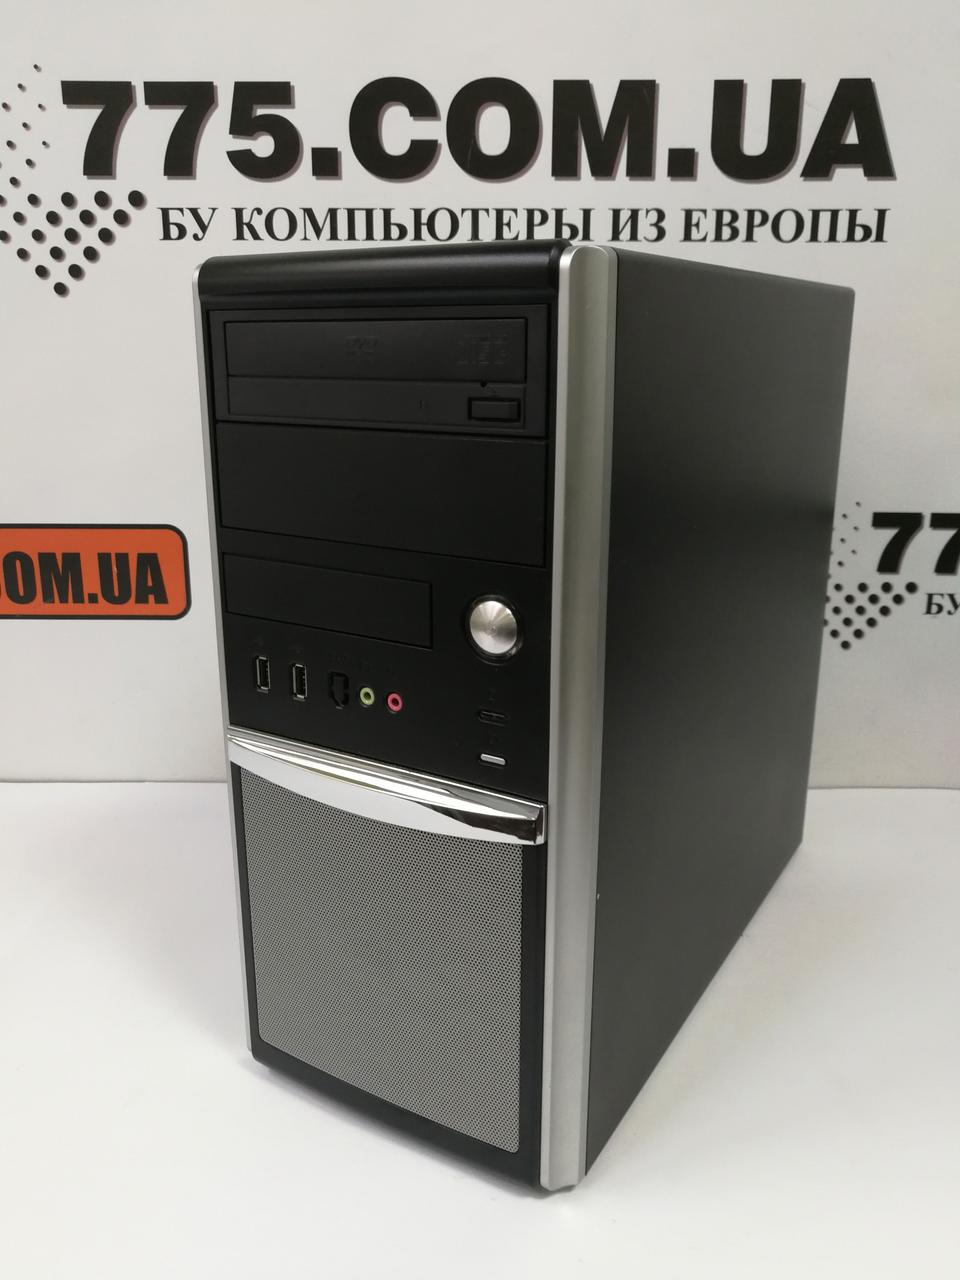 Игровой компьютер, Intel Core i5-650 3.46GHz, RAM 8ГБ, HDD 500ГБ, GTX 1050 2GB